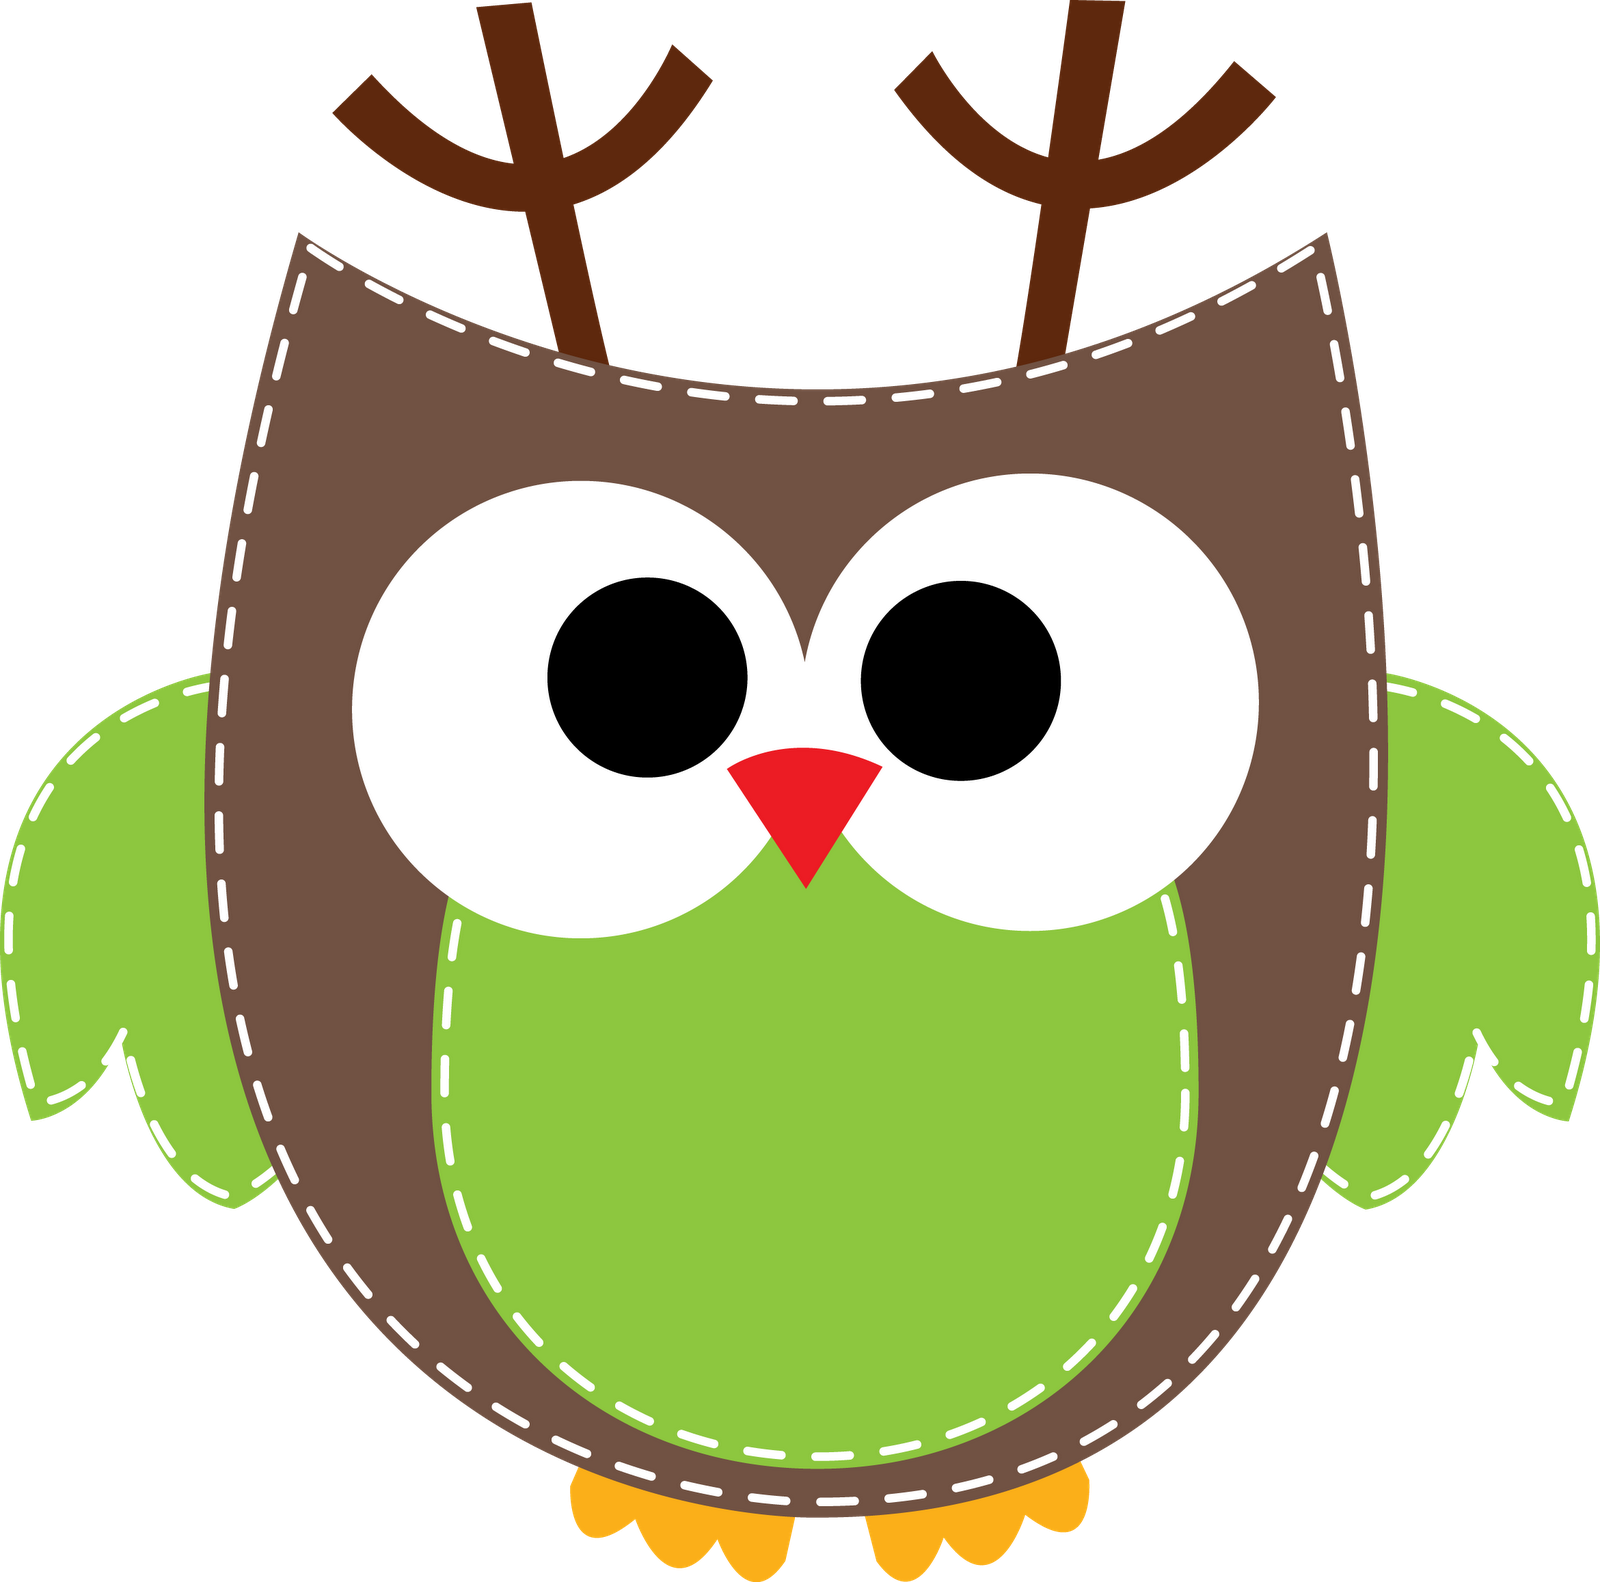 Math Clipart Teachers - Criket Projects Christmas Owls Owl